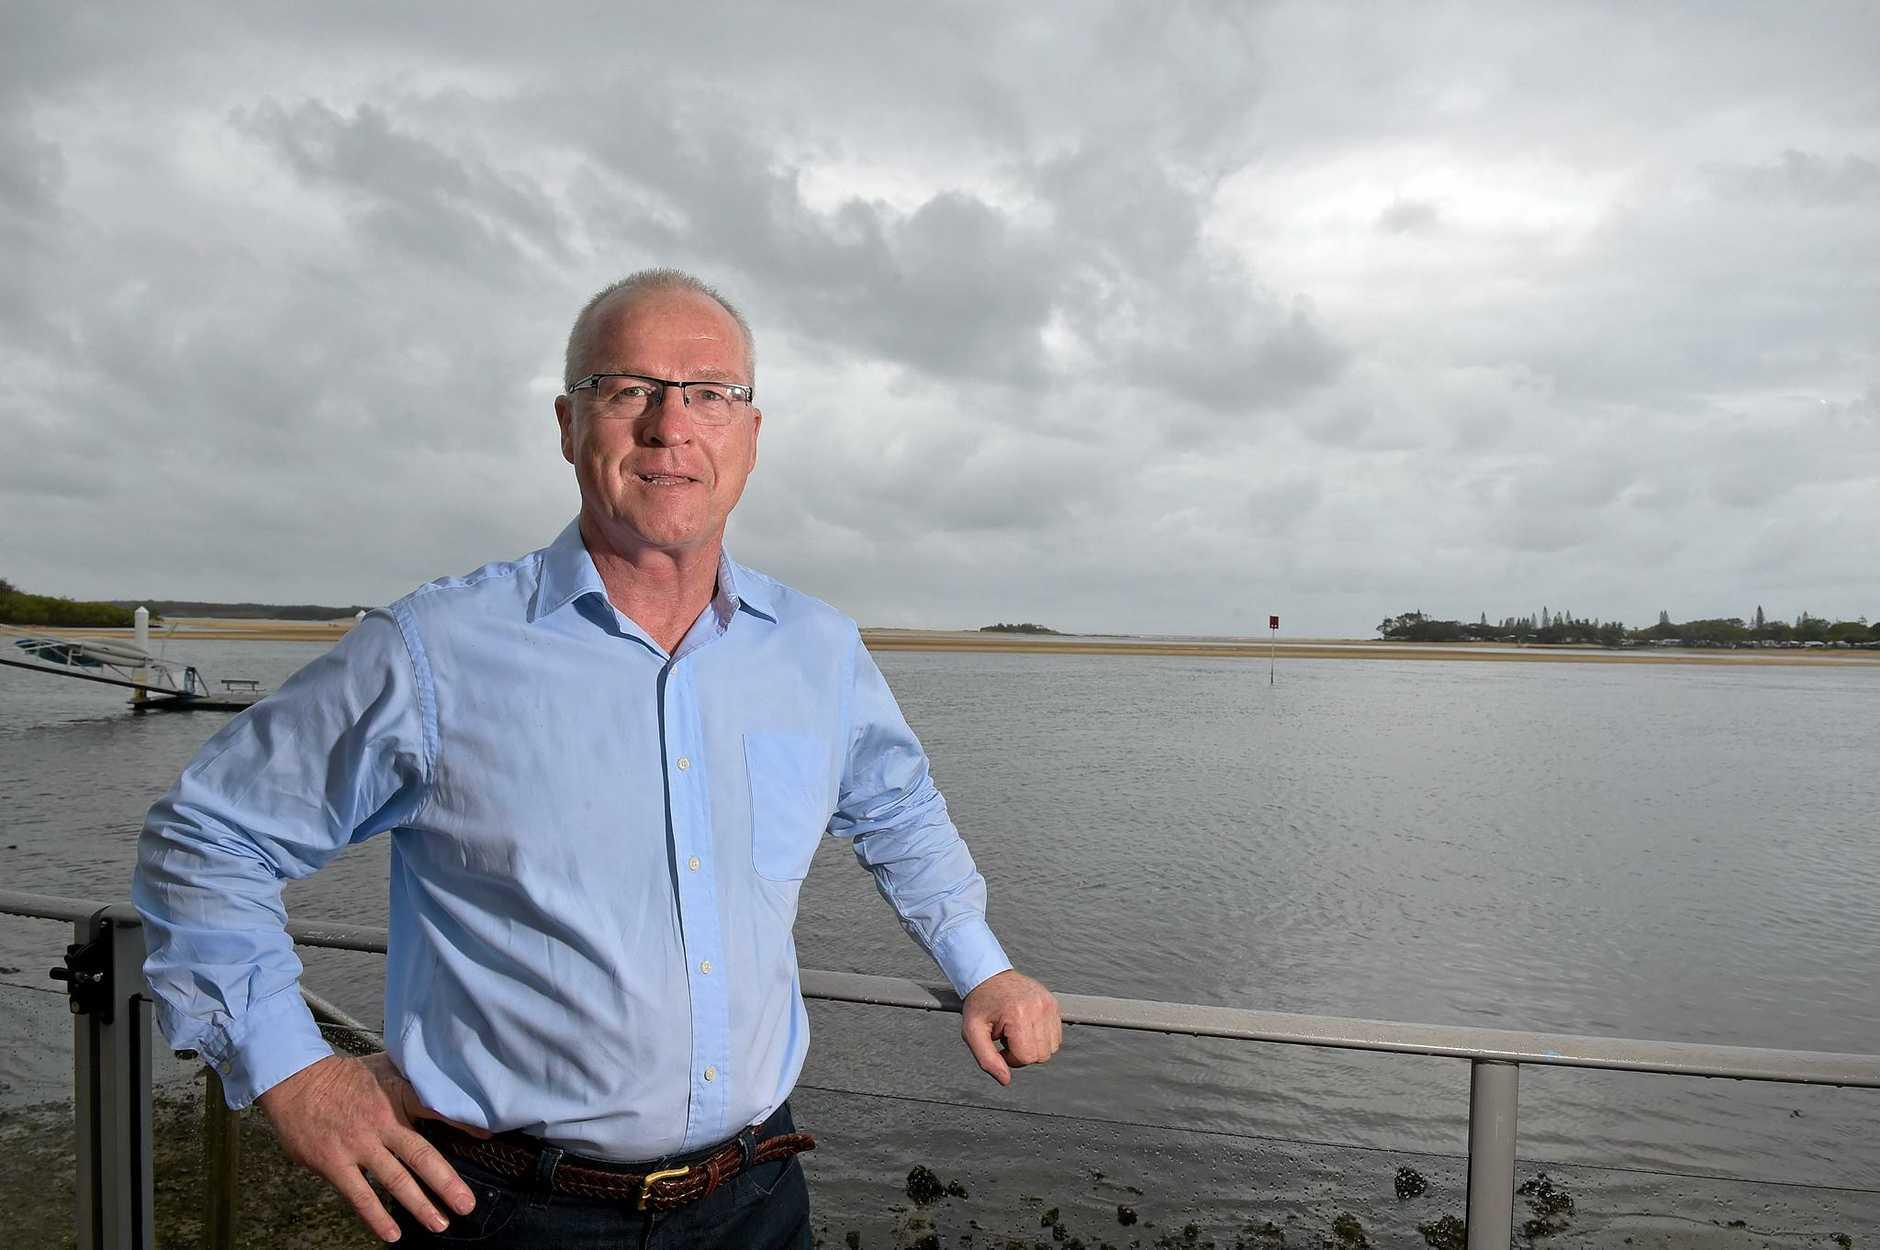 Mark Jamieson is the new patron for Coast children's charity SunnyKids.